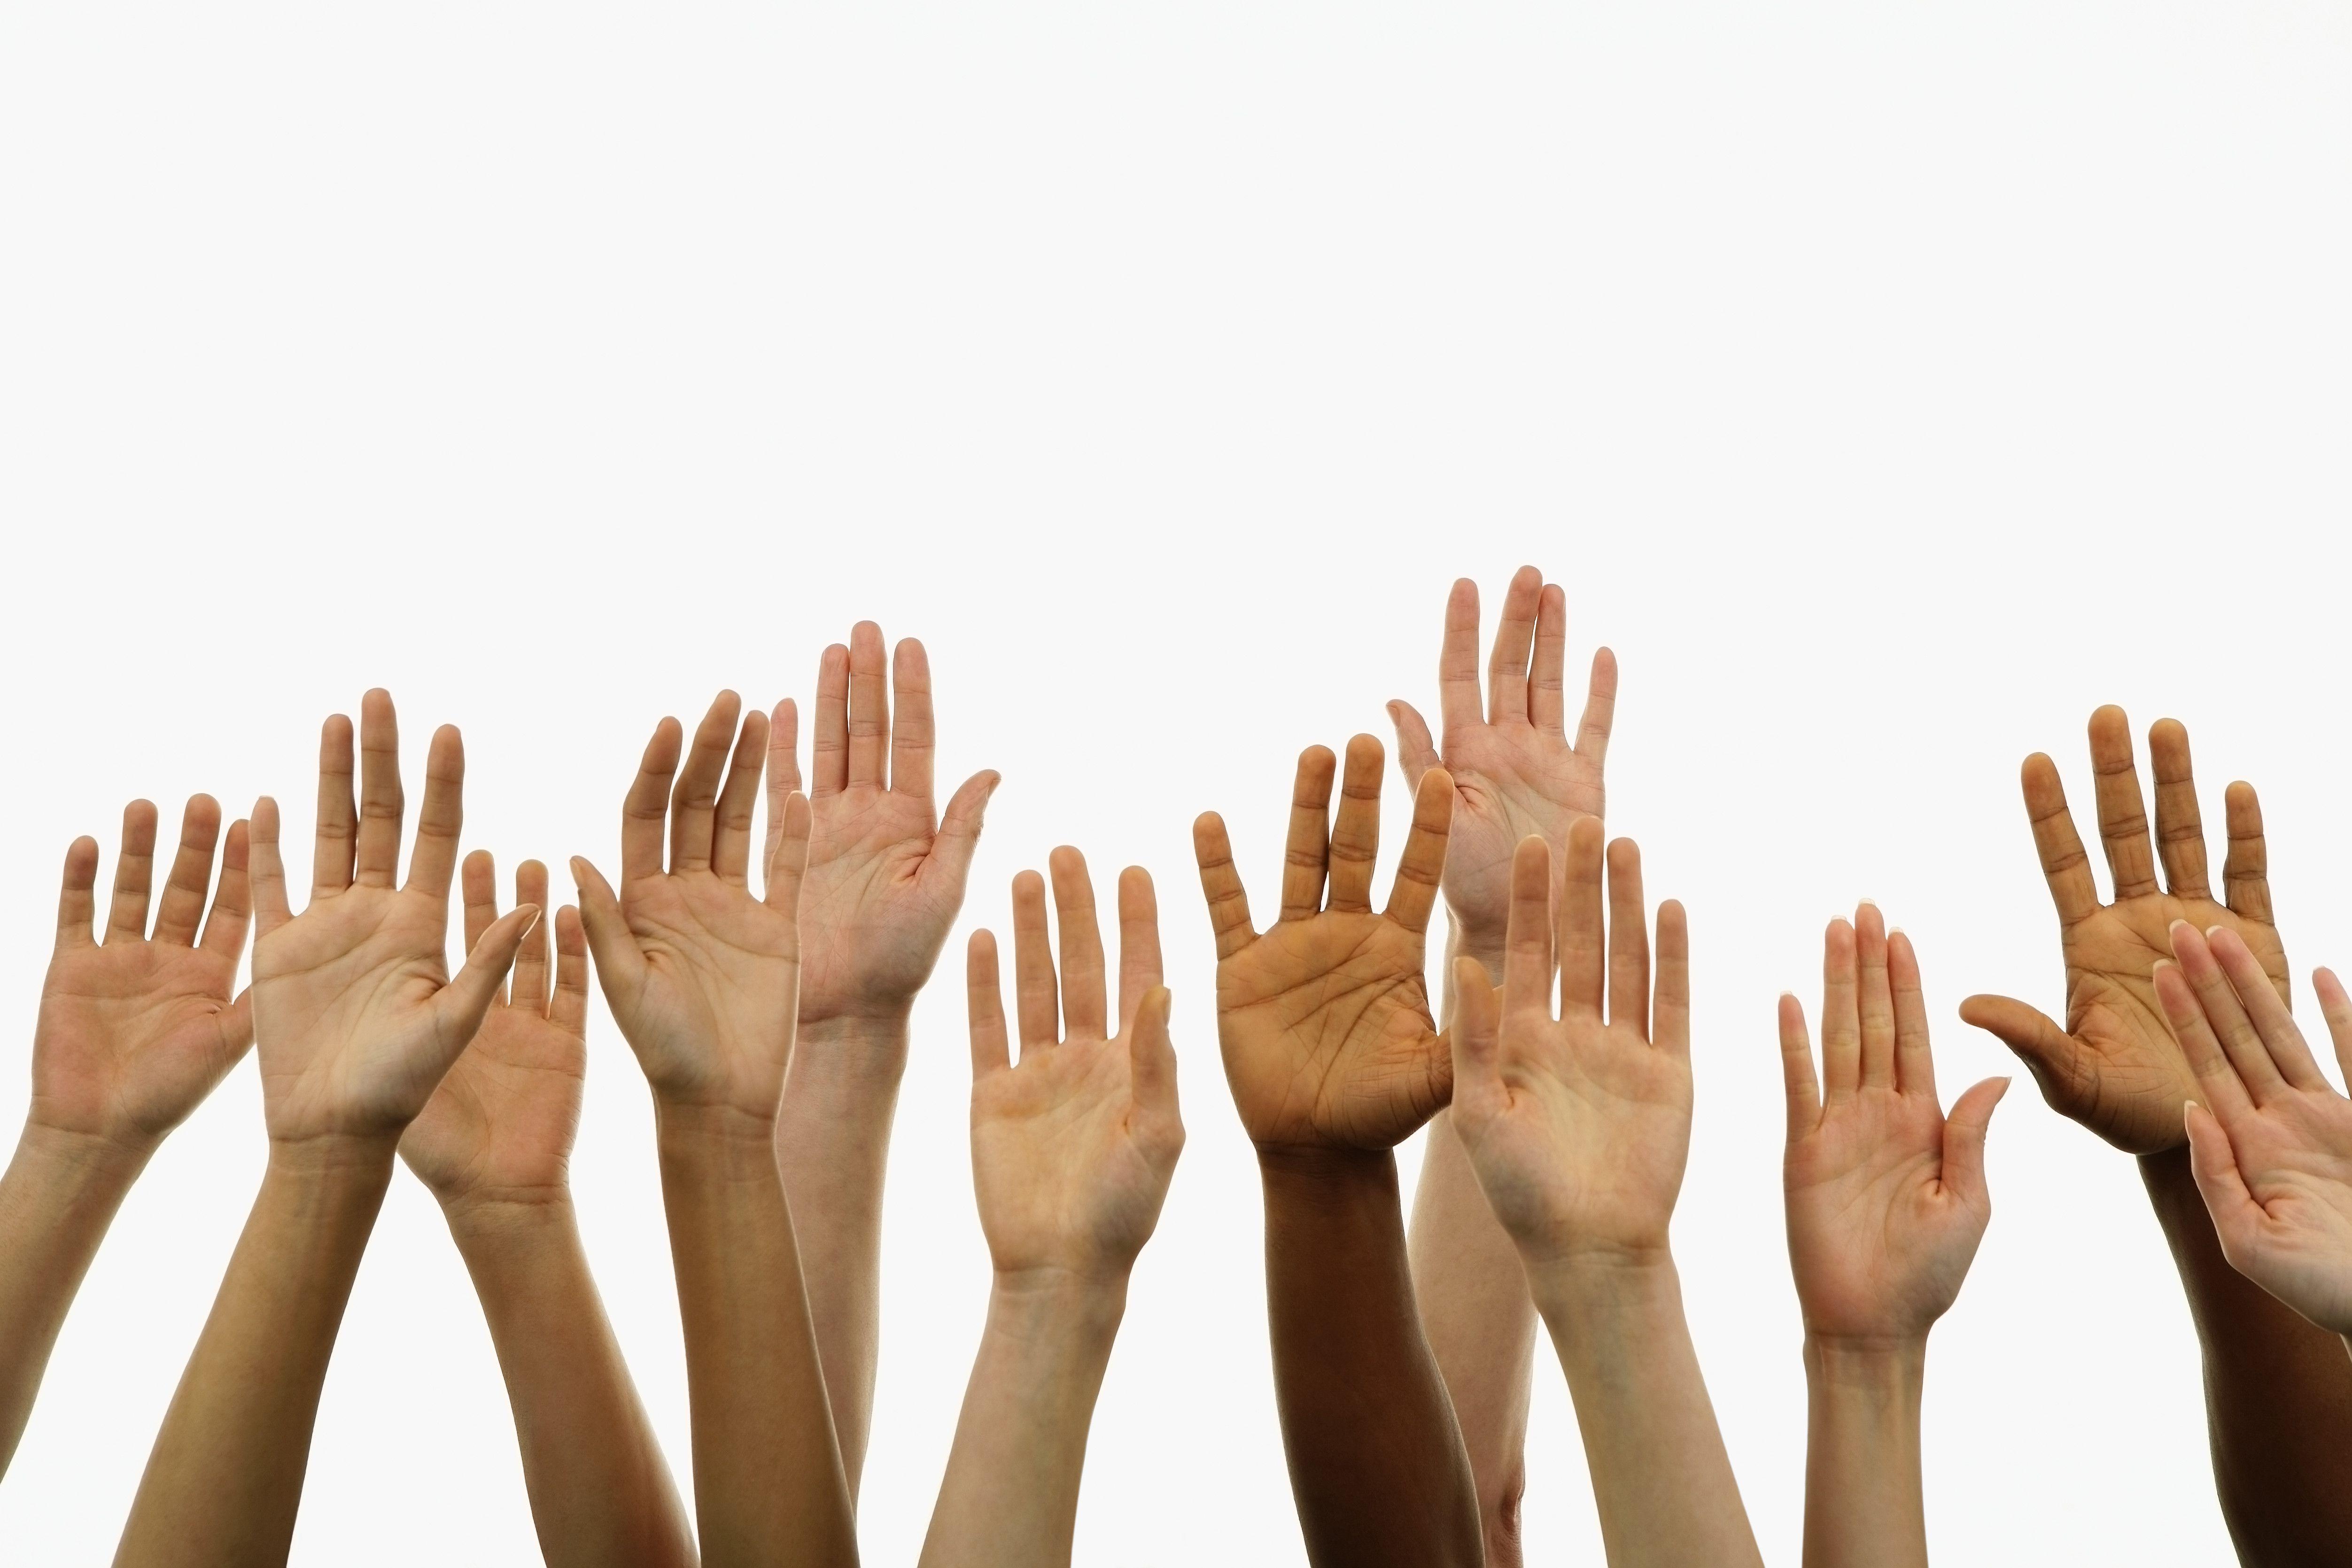 Image of Hands Raised